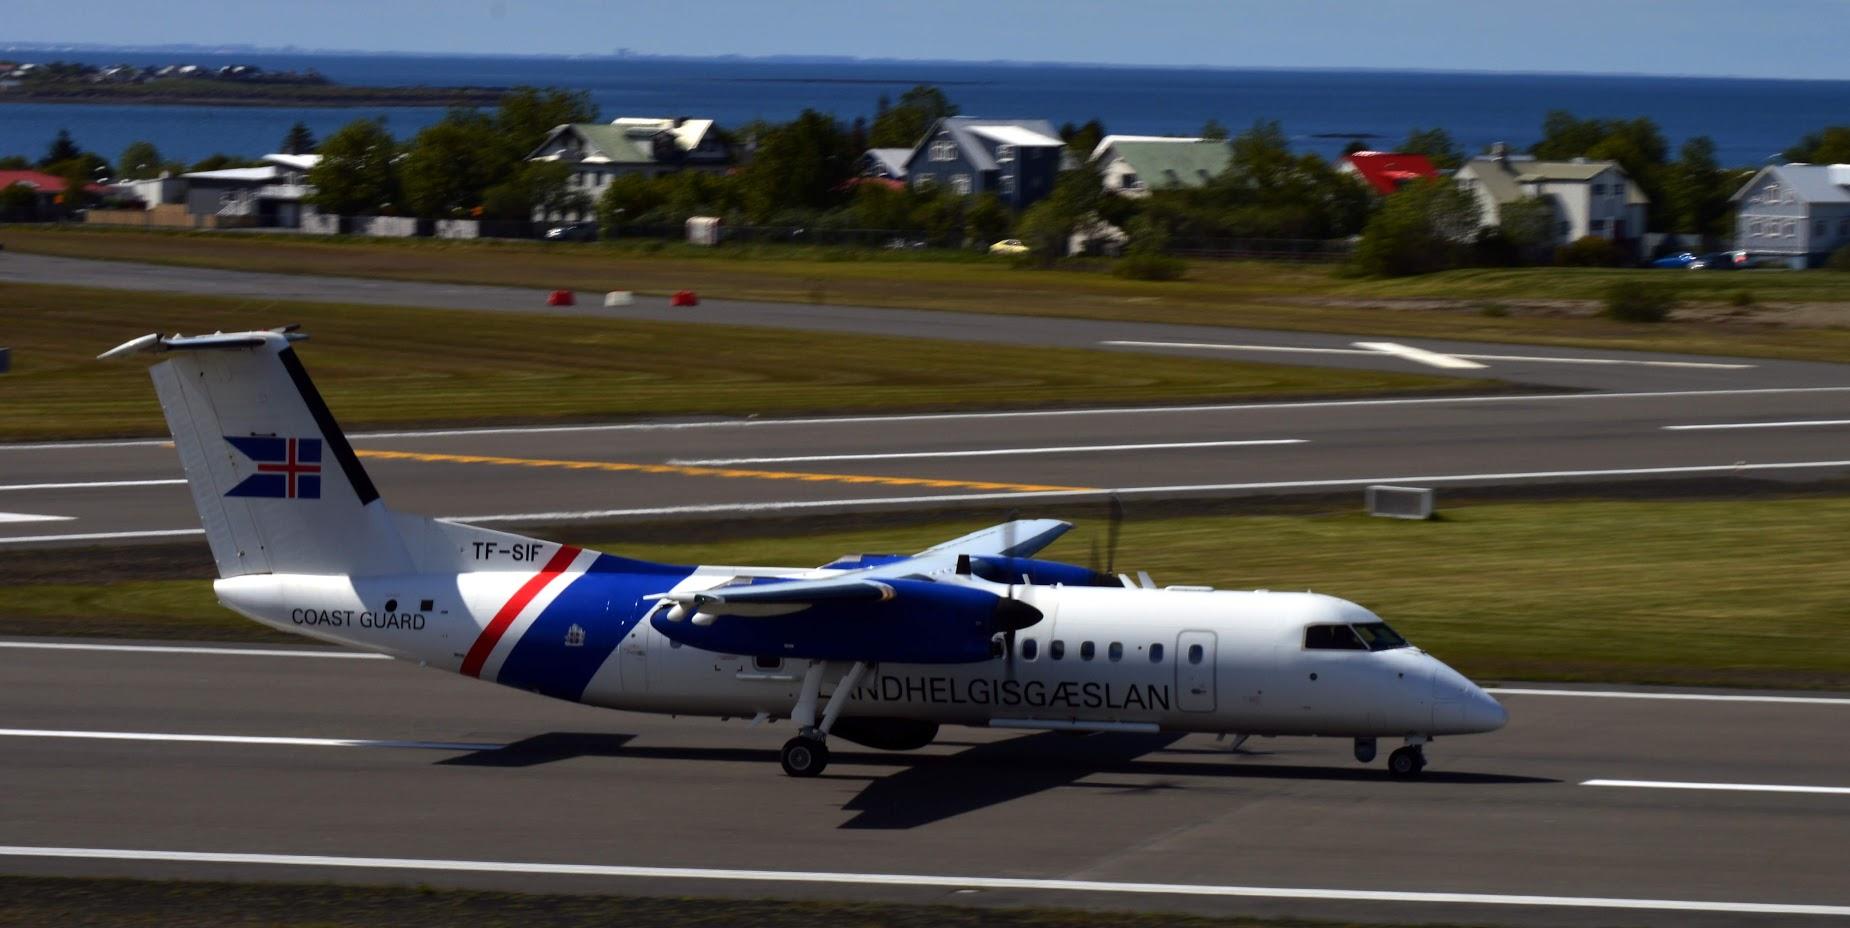 Icelandic Coast Guard Bombardier Dash 8 Q300MSA TF-SIF on Reykjavik Airshow 2019 // Source: PBY-5A Cataline lowpass on runway 01 in Reykjavik airport during airshow 2019 // Source: Halldór Sigurðsson